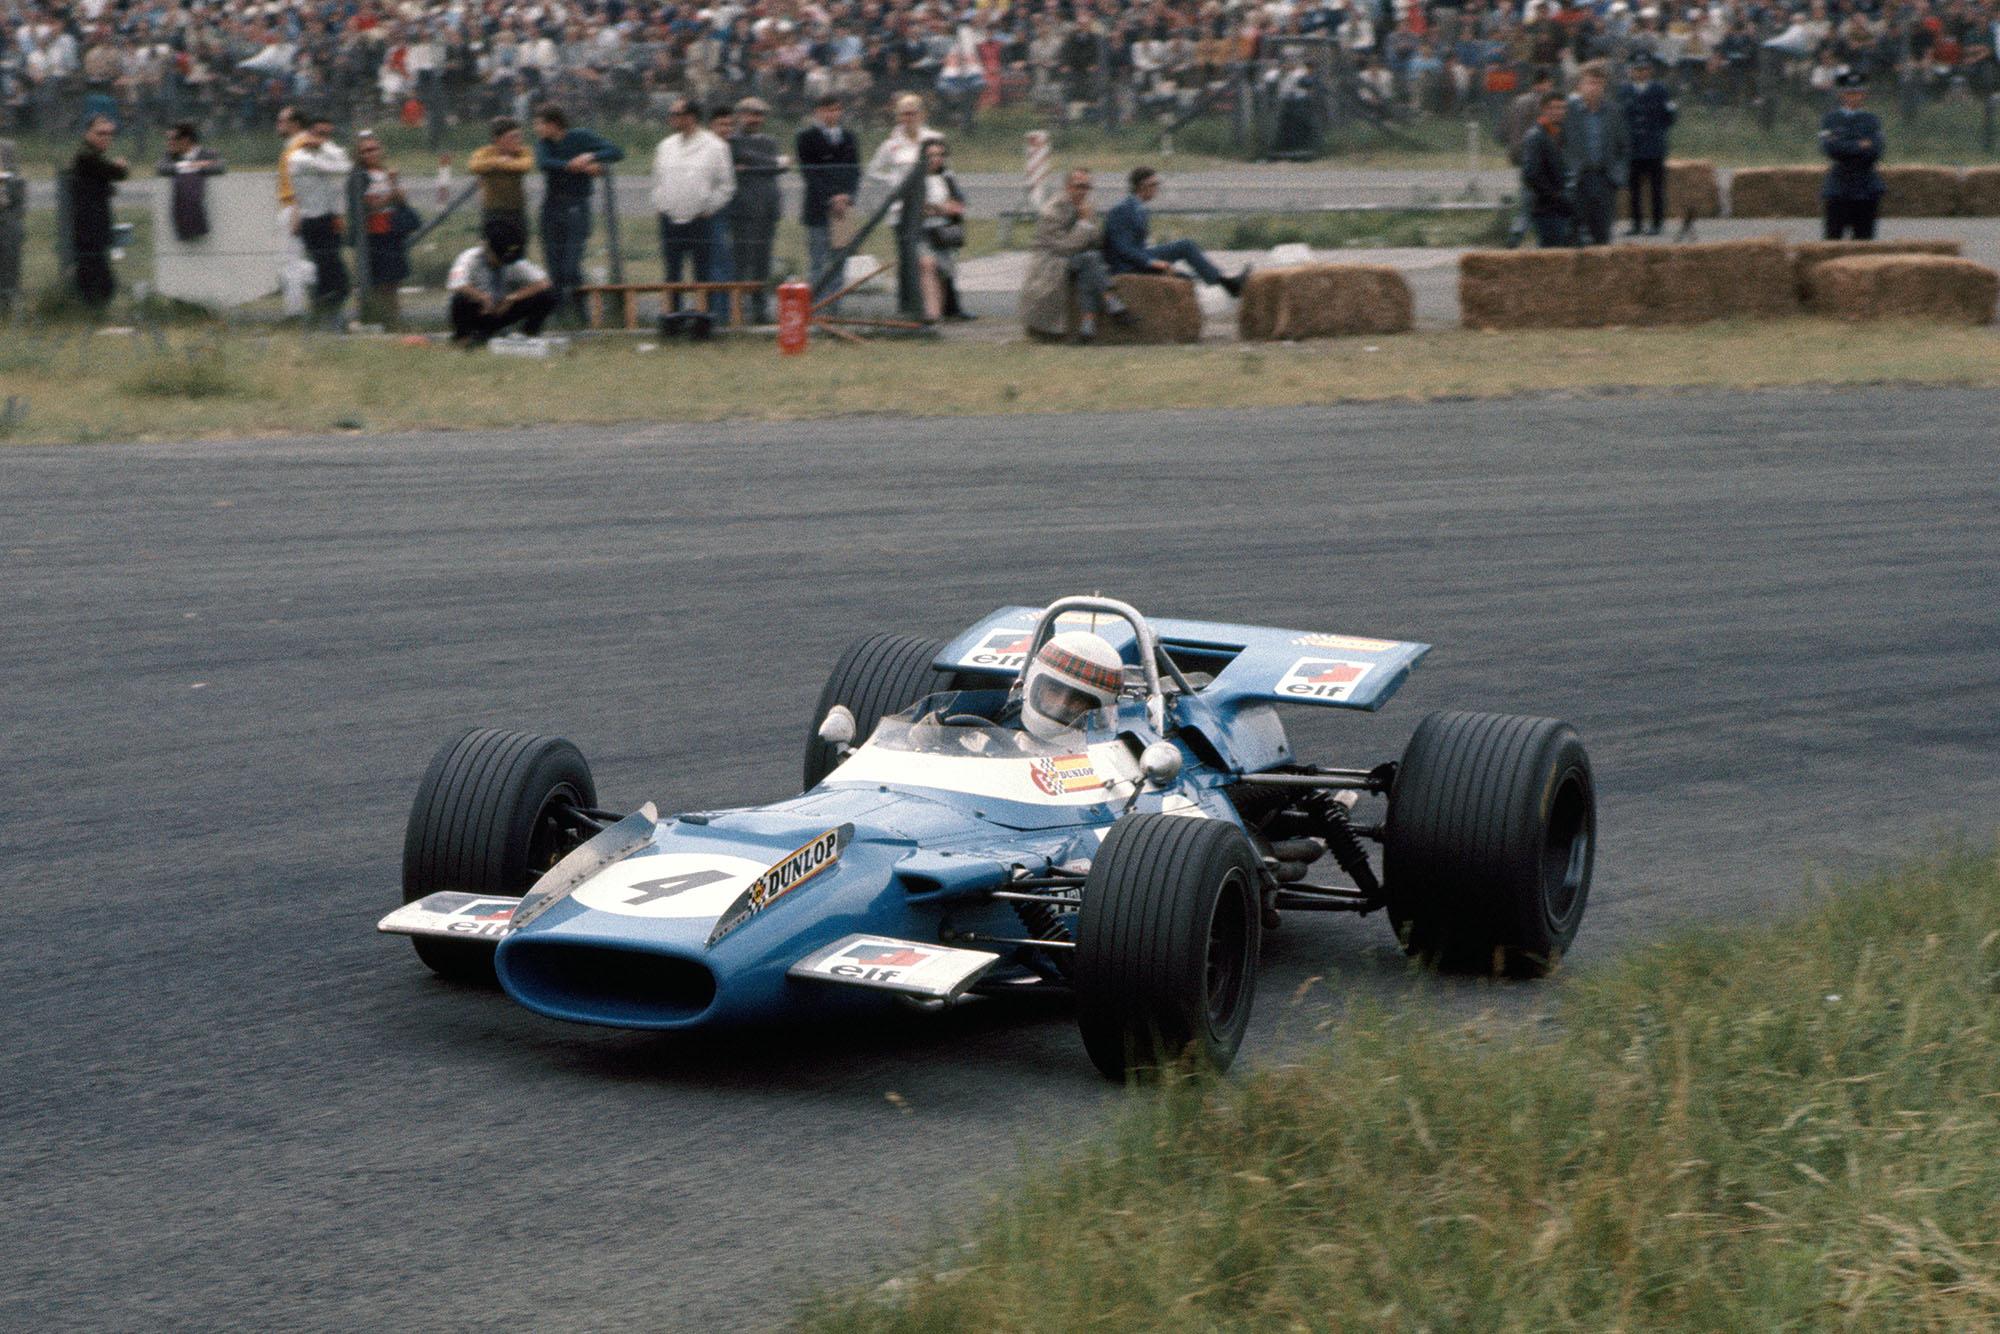 Jackie Stewart in his Matra at the 1969 Dutch Grand Prix